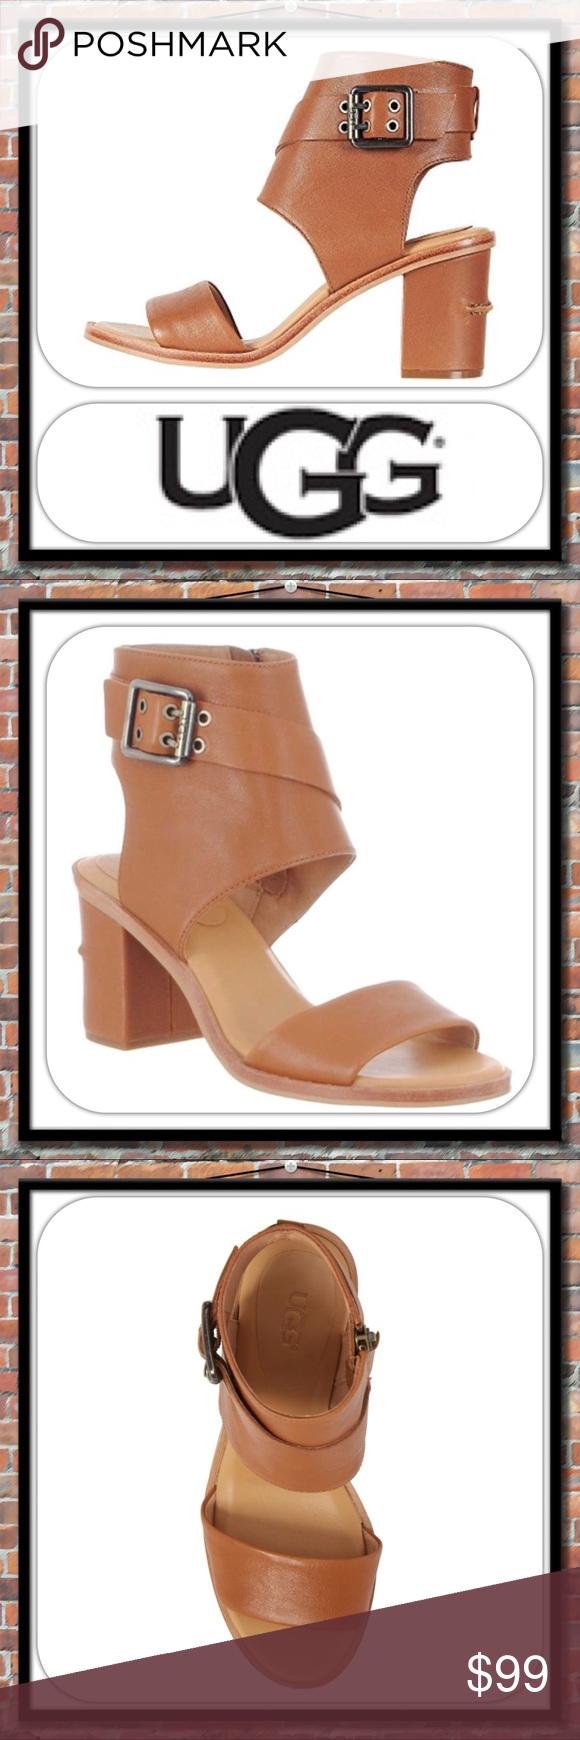 ded05d253c409 UGG Claudette Block Heel Sandal The UGG Claudette Sandal in Almond! A  belted ankle cuff